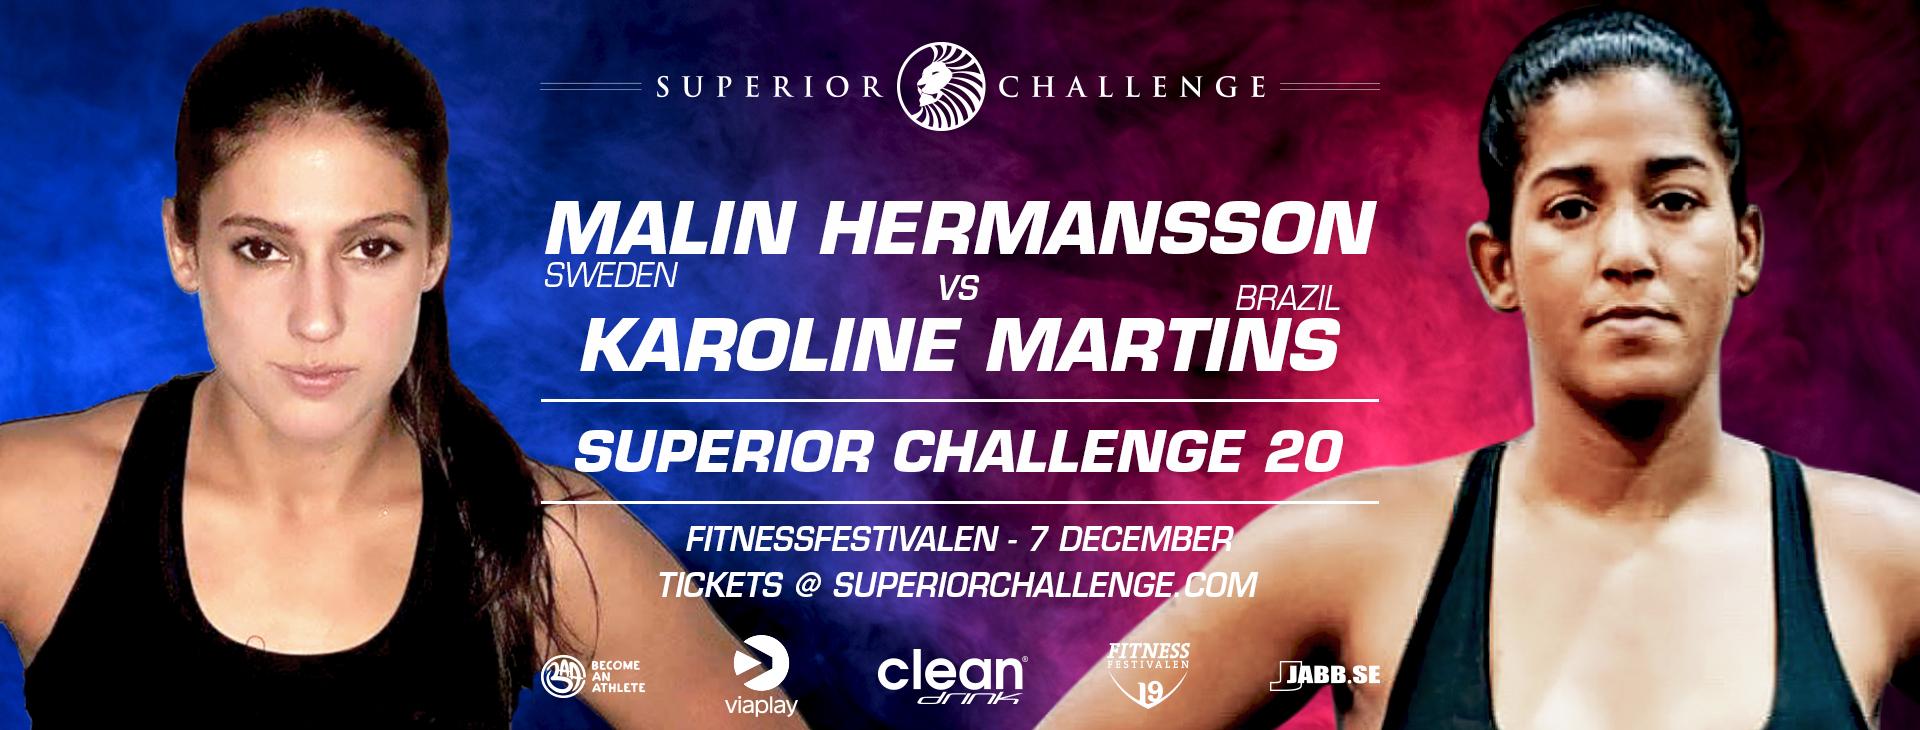 Malin Hermansson vs Karoline Martins Superior Challenge 20 - Fitnessfestivalen